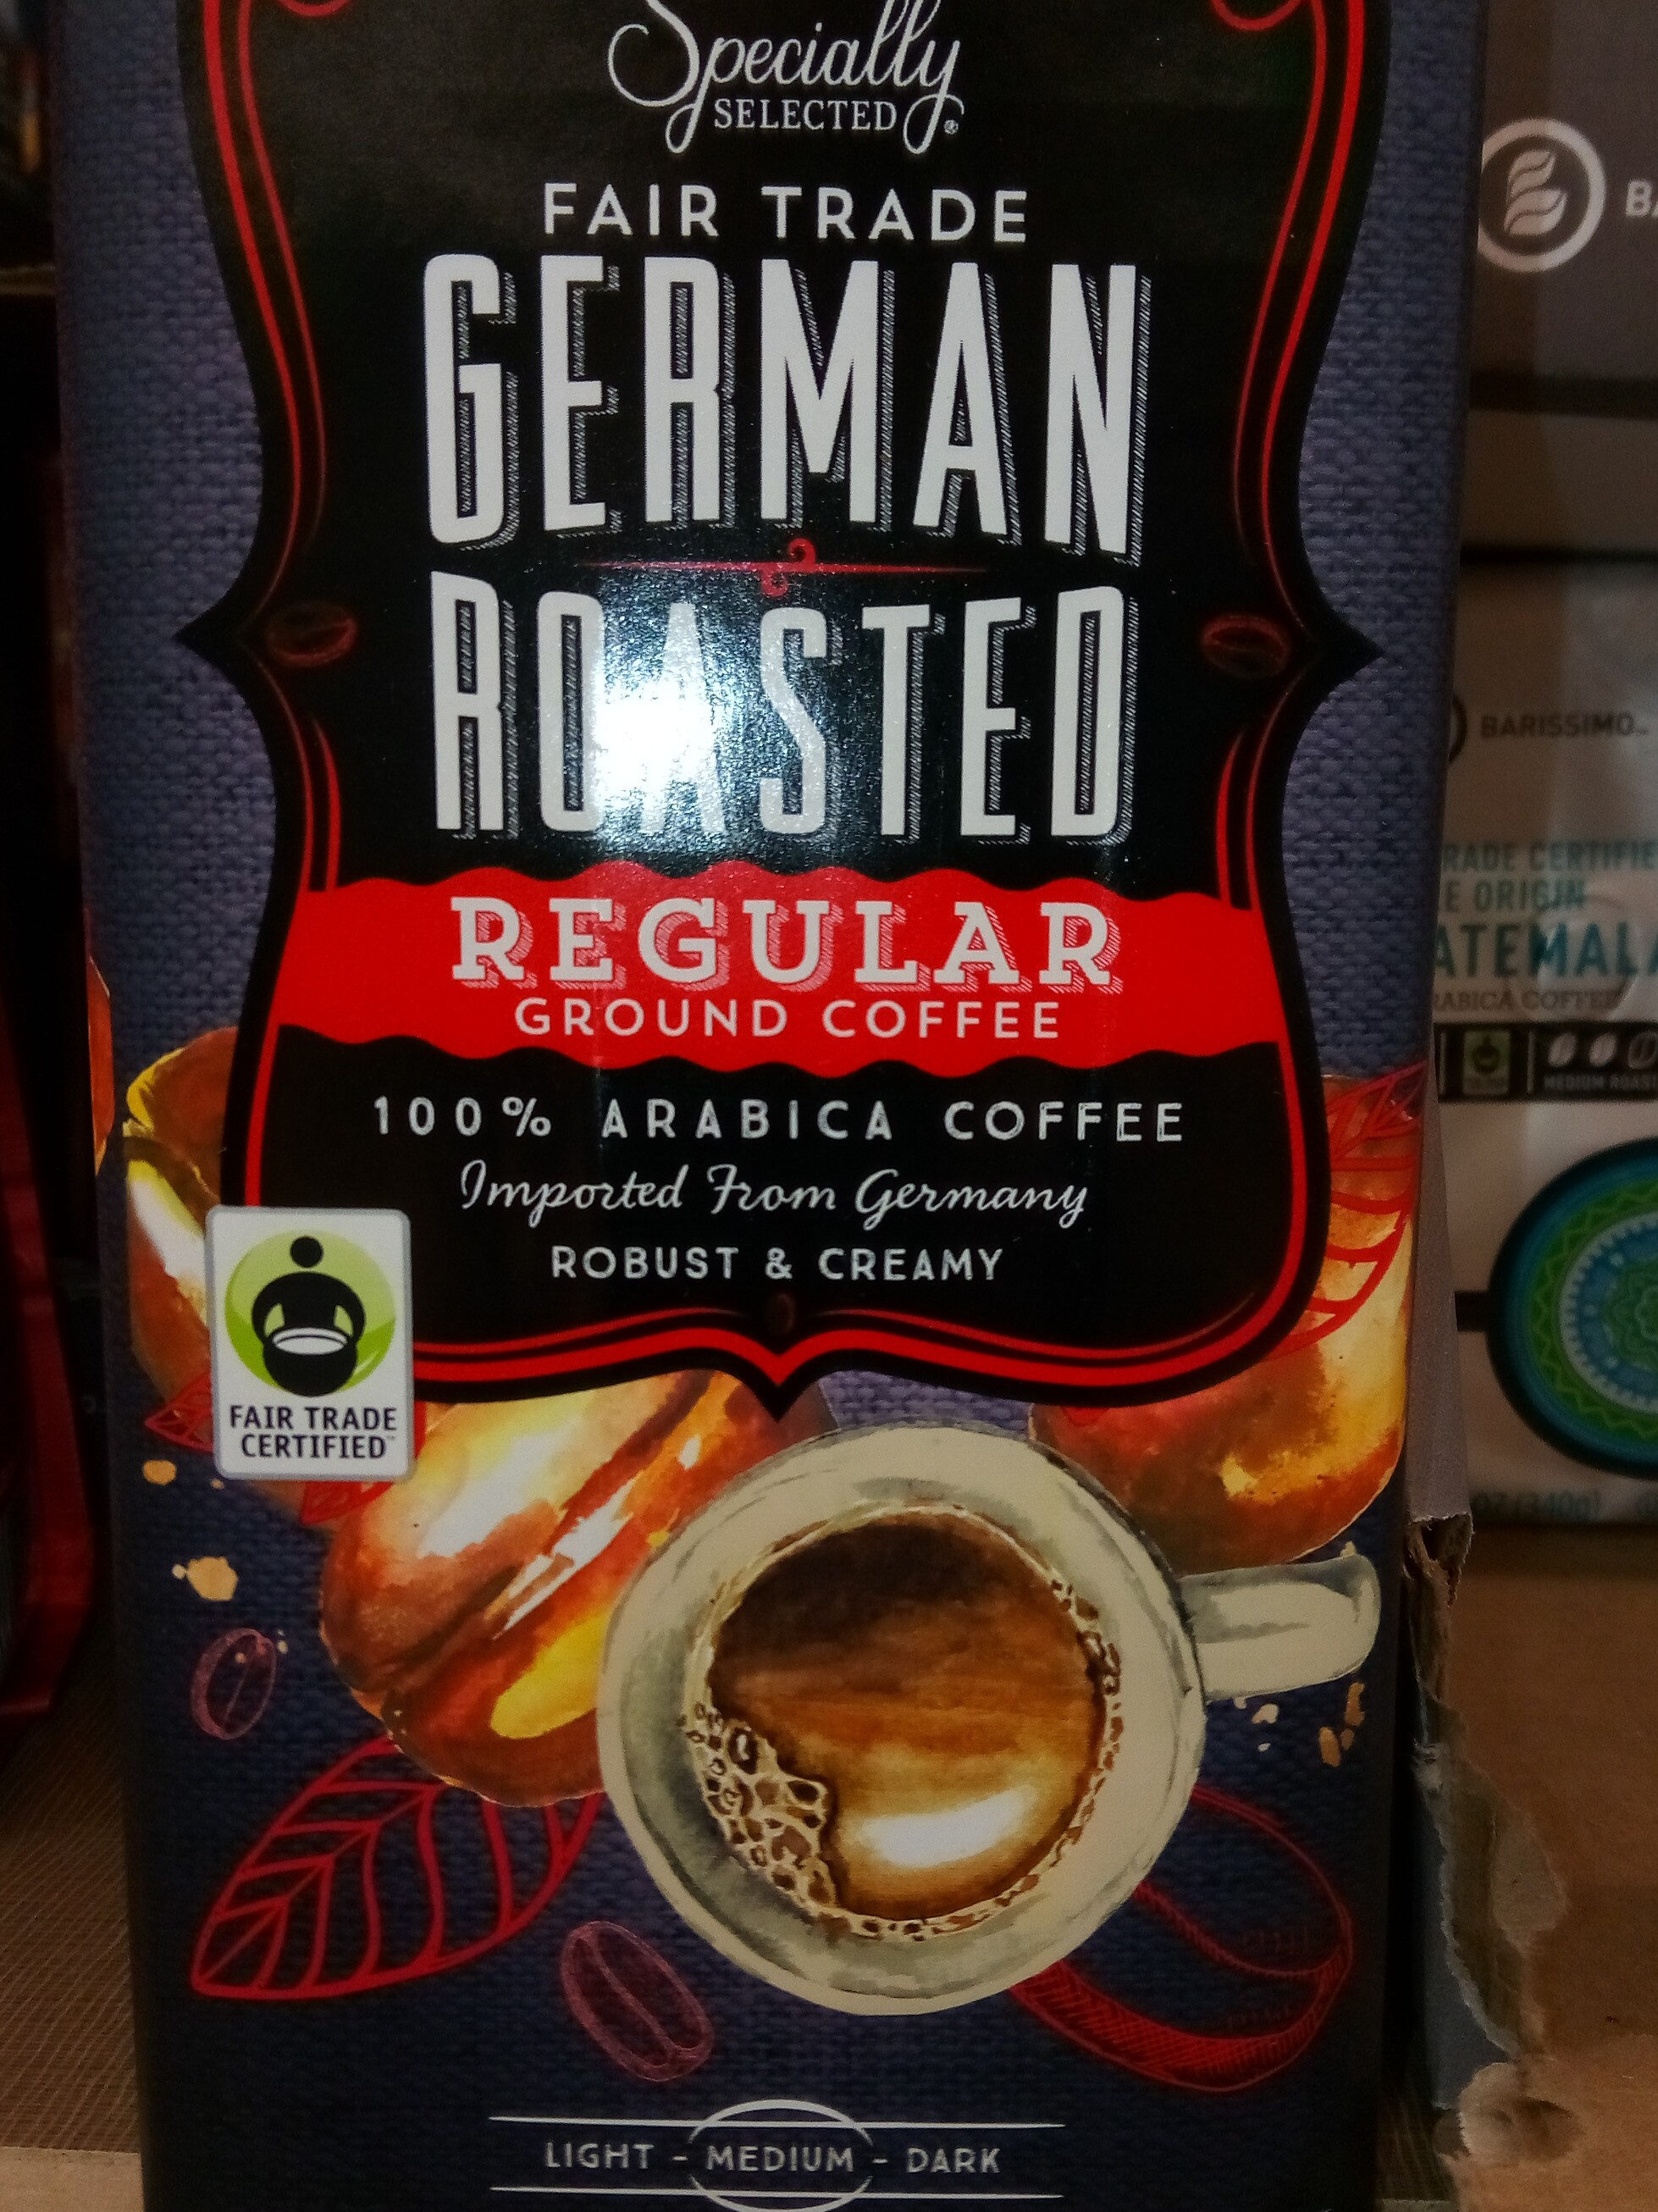 specialty selected fair trade German roasted regular ground coffee - Produit